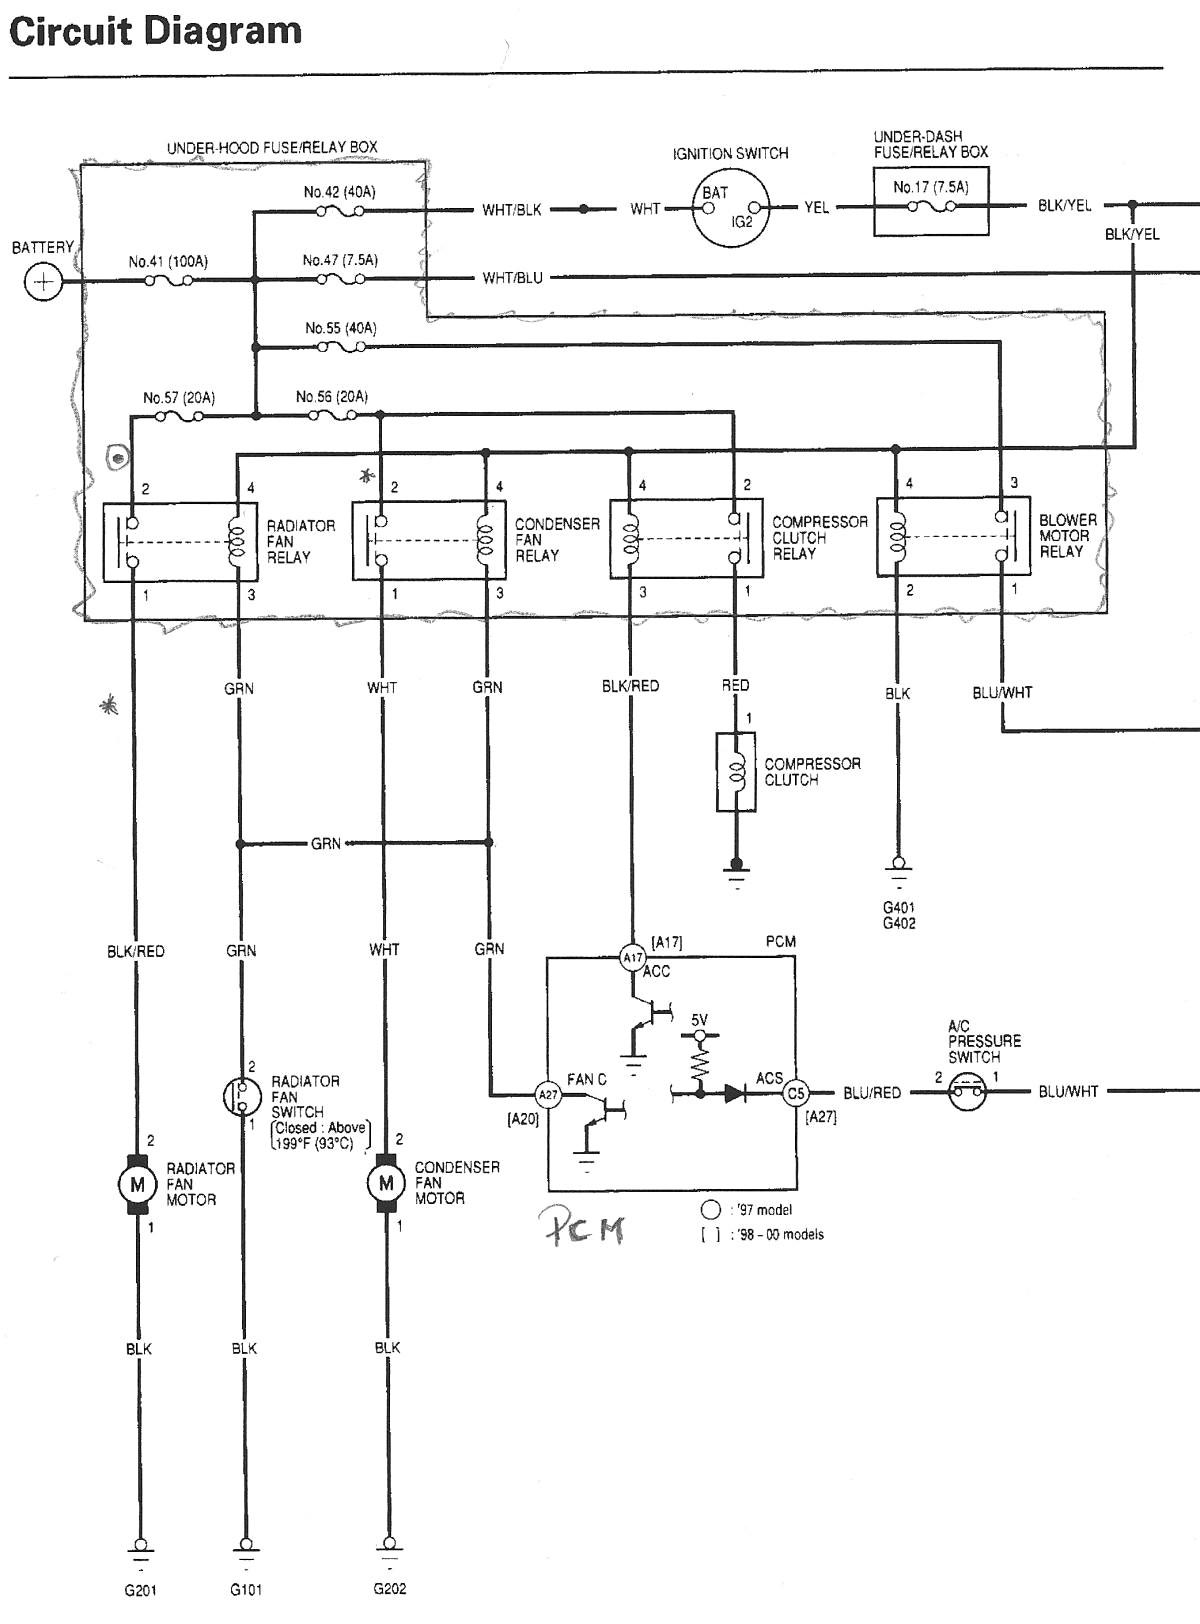 2003 Honda Civic Engine Diagram Wiring Diagram 2003 Honda Civic Brilliant  Accord Blurts Of 2003 Honda